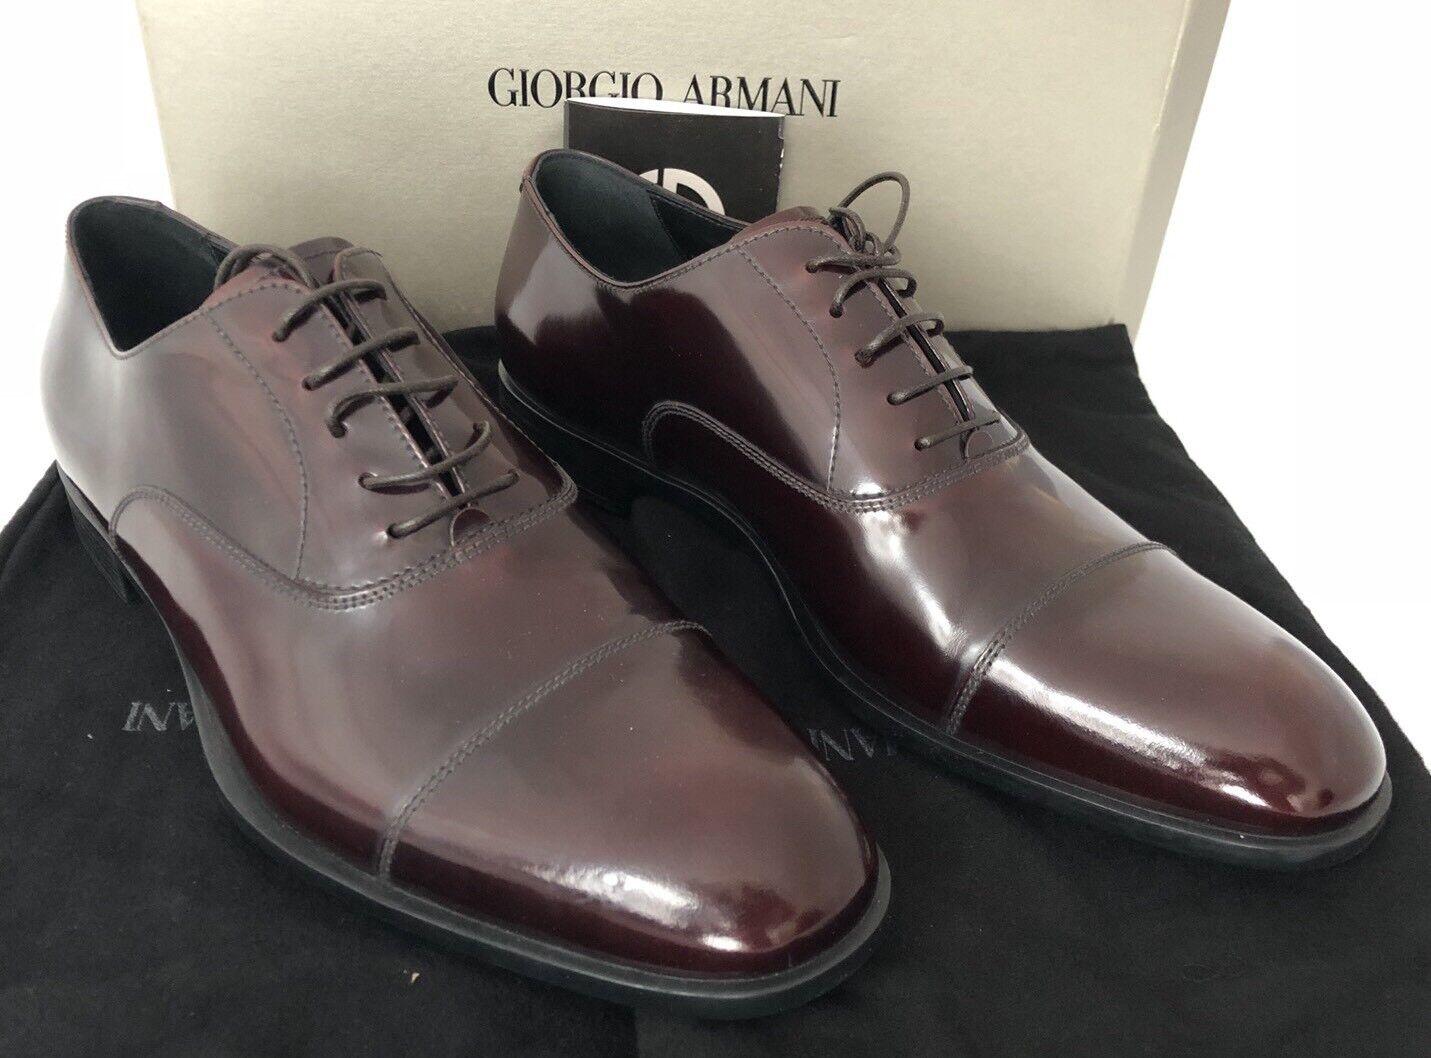 NIB  Giorgio Armani Leather Men's Galaxy Brown Oxford shoes 12.5 US X2C455